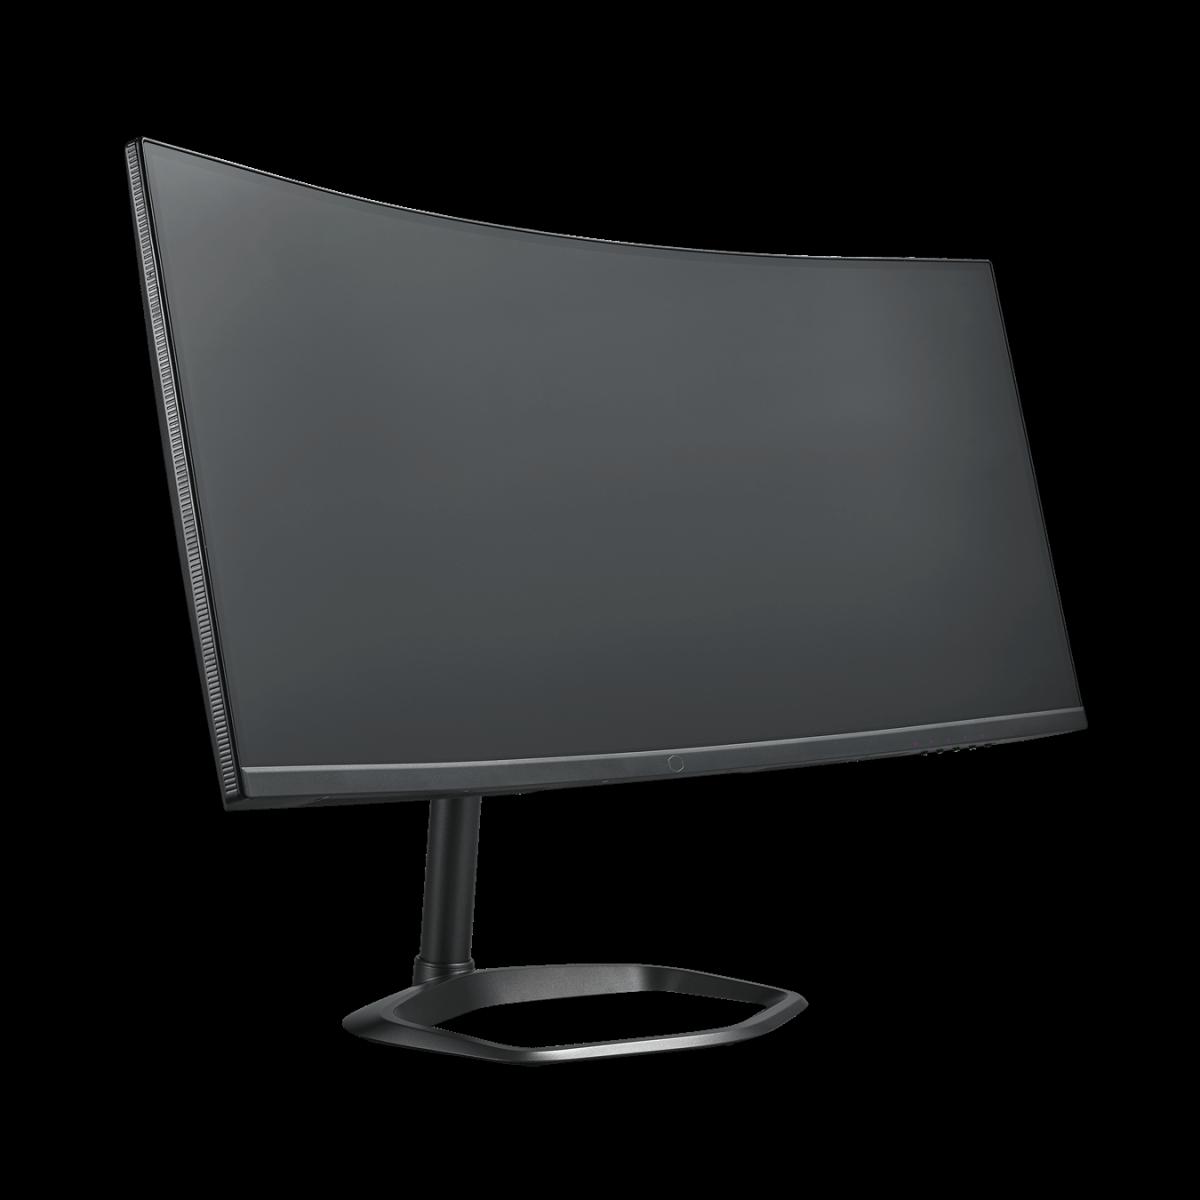 Monitor Gamer Cooler Master GM24-CW, 34 Pol, Curvo, Ultra Wide QHD, 144Hz, 1ms, HDMI/DP, CMI-GM34-CW